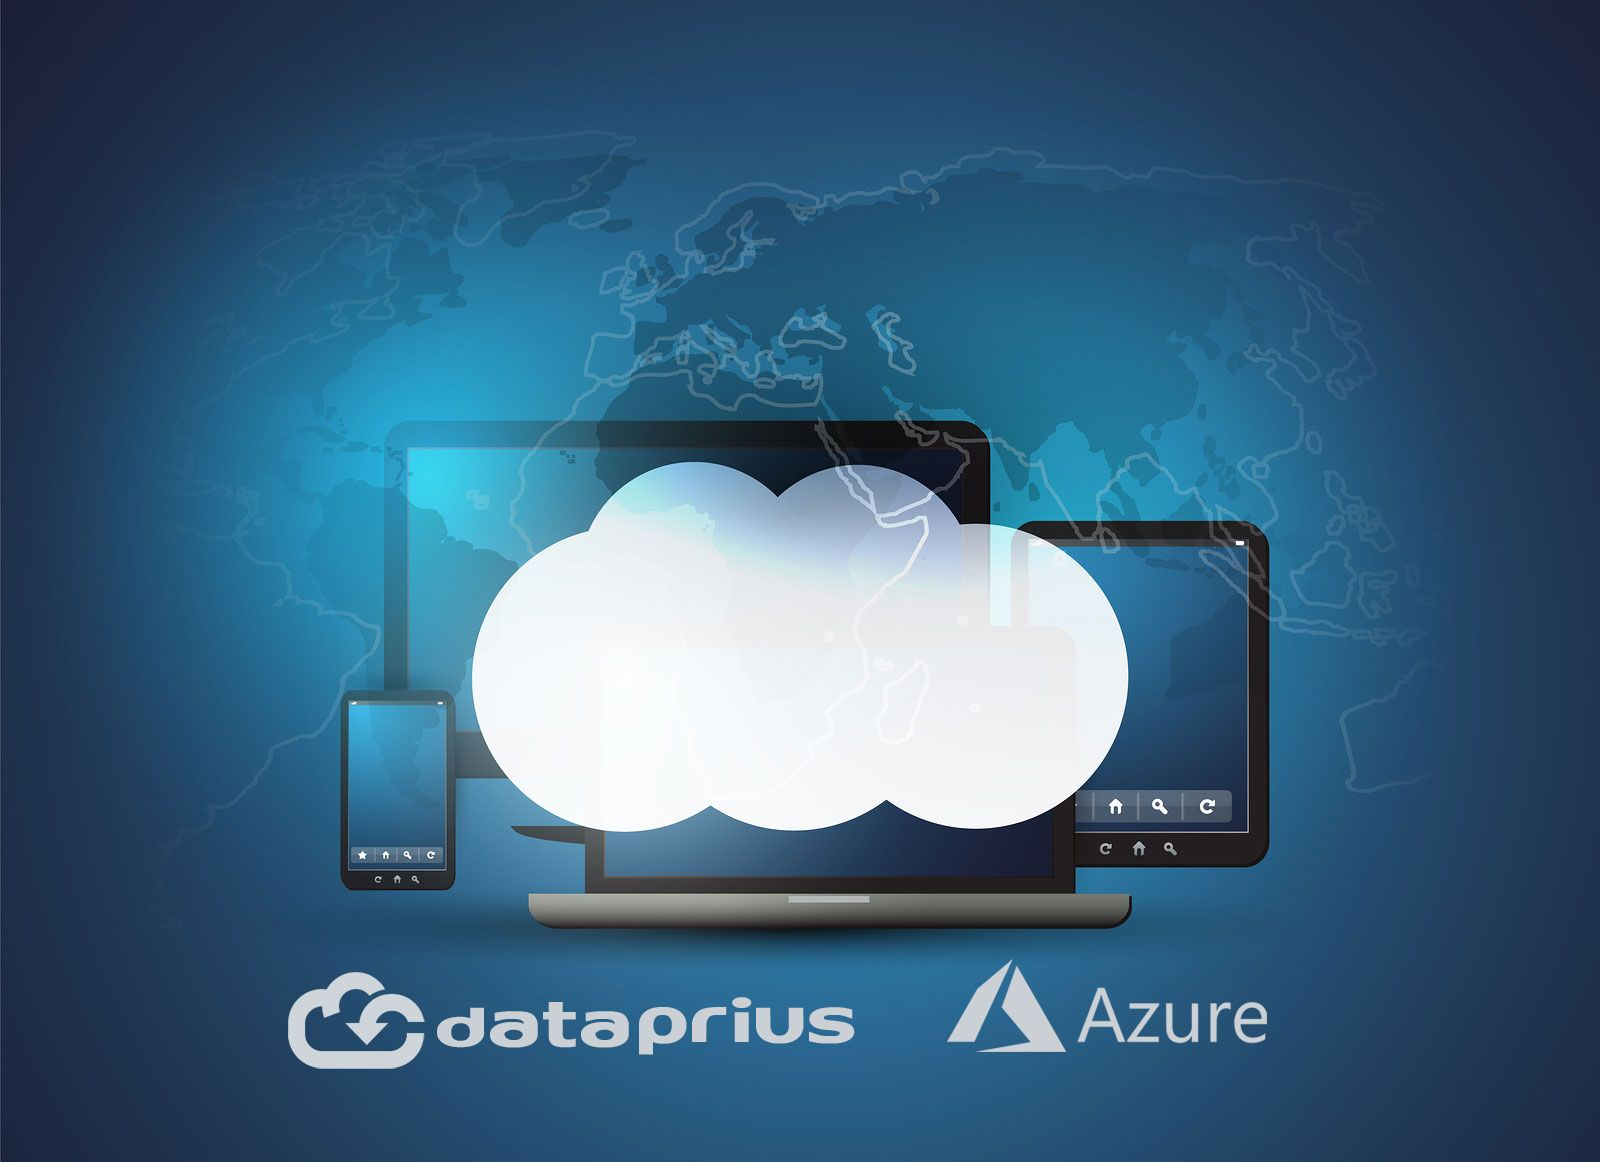 Foto de Cloud Dataprius Azure